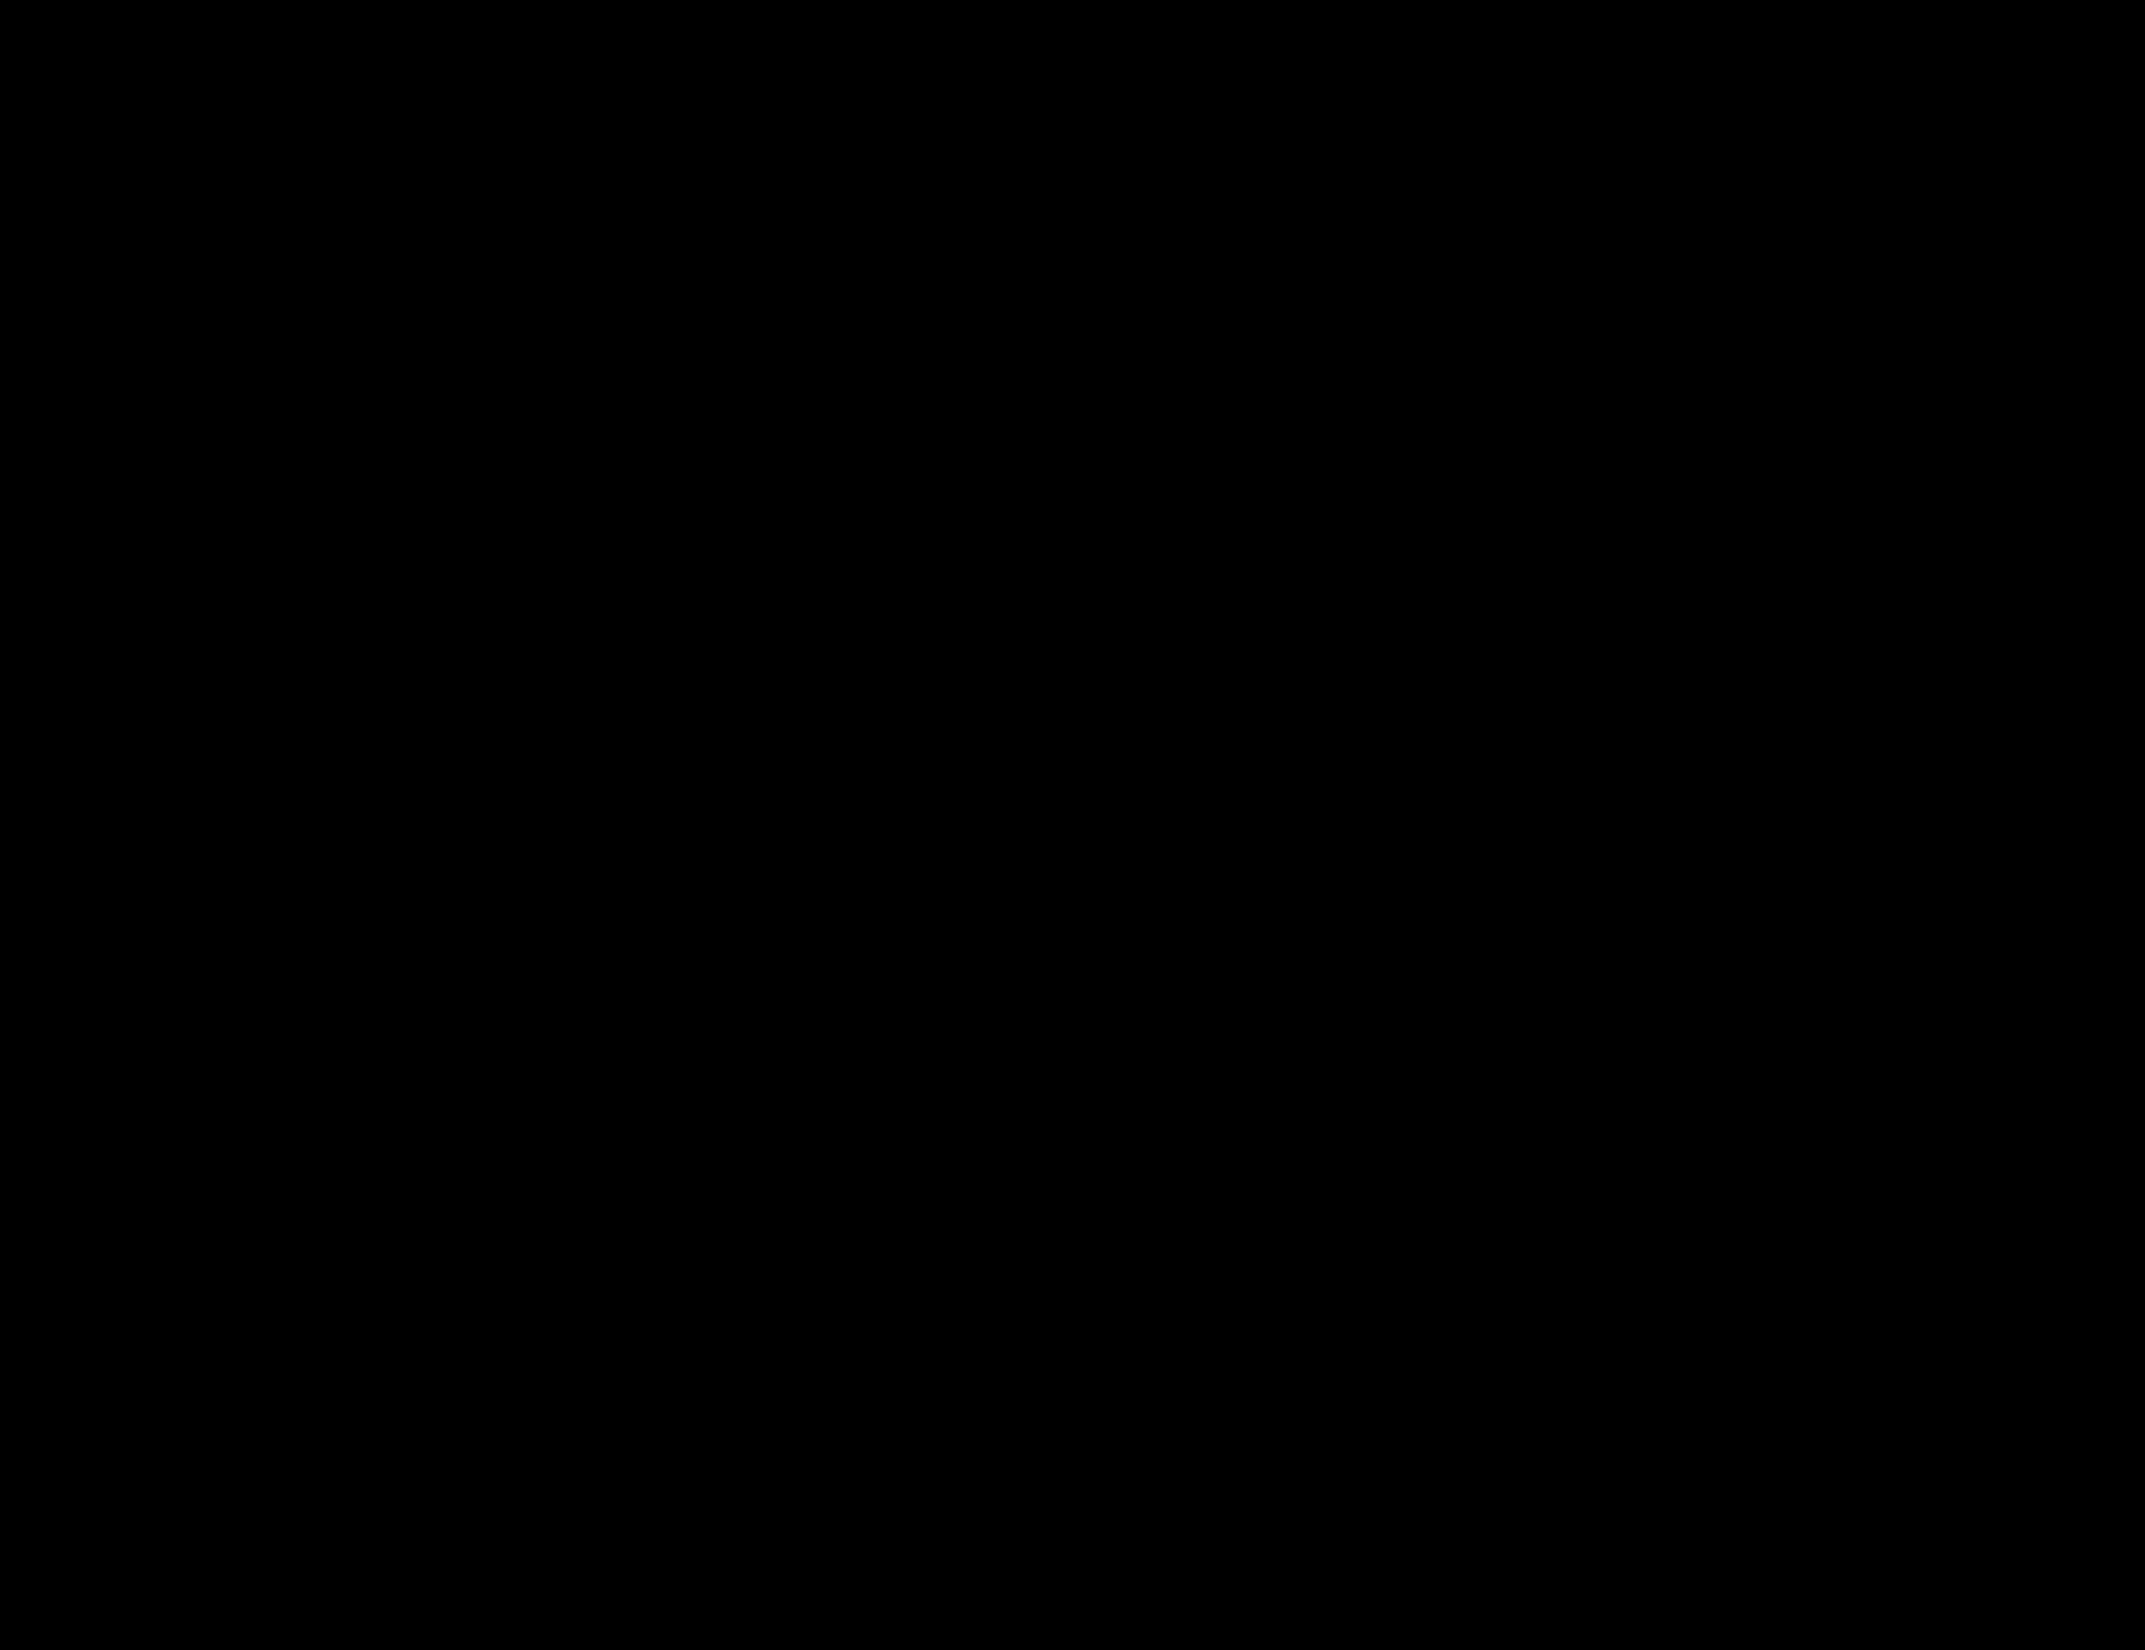 Black and White Accordion Instrument Vector Clip Art